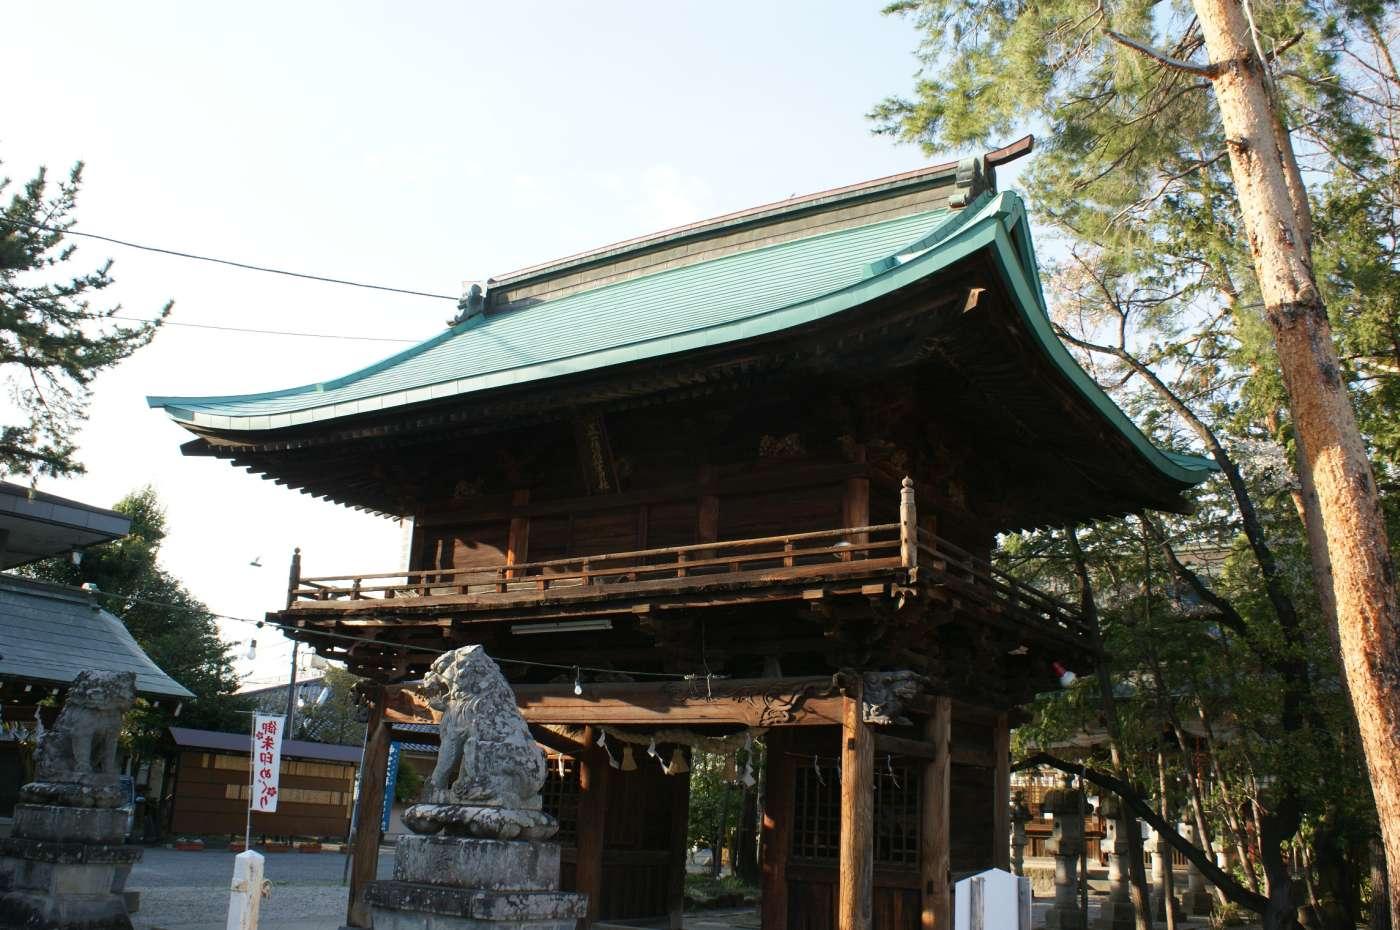 https://www.sumainomatsuki.com/folder1/DSC07427.JPG